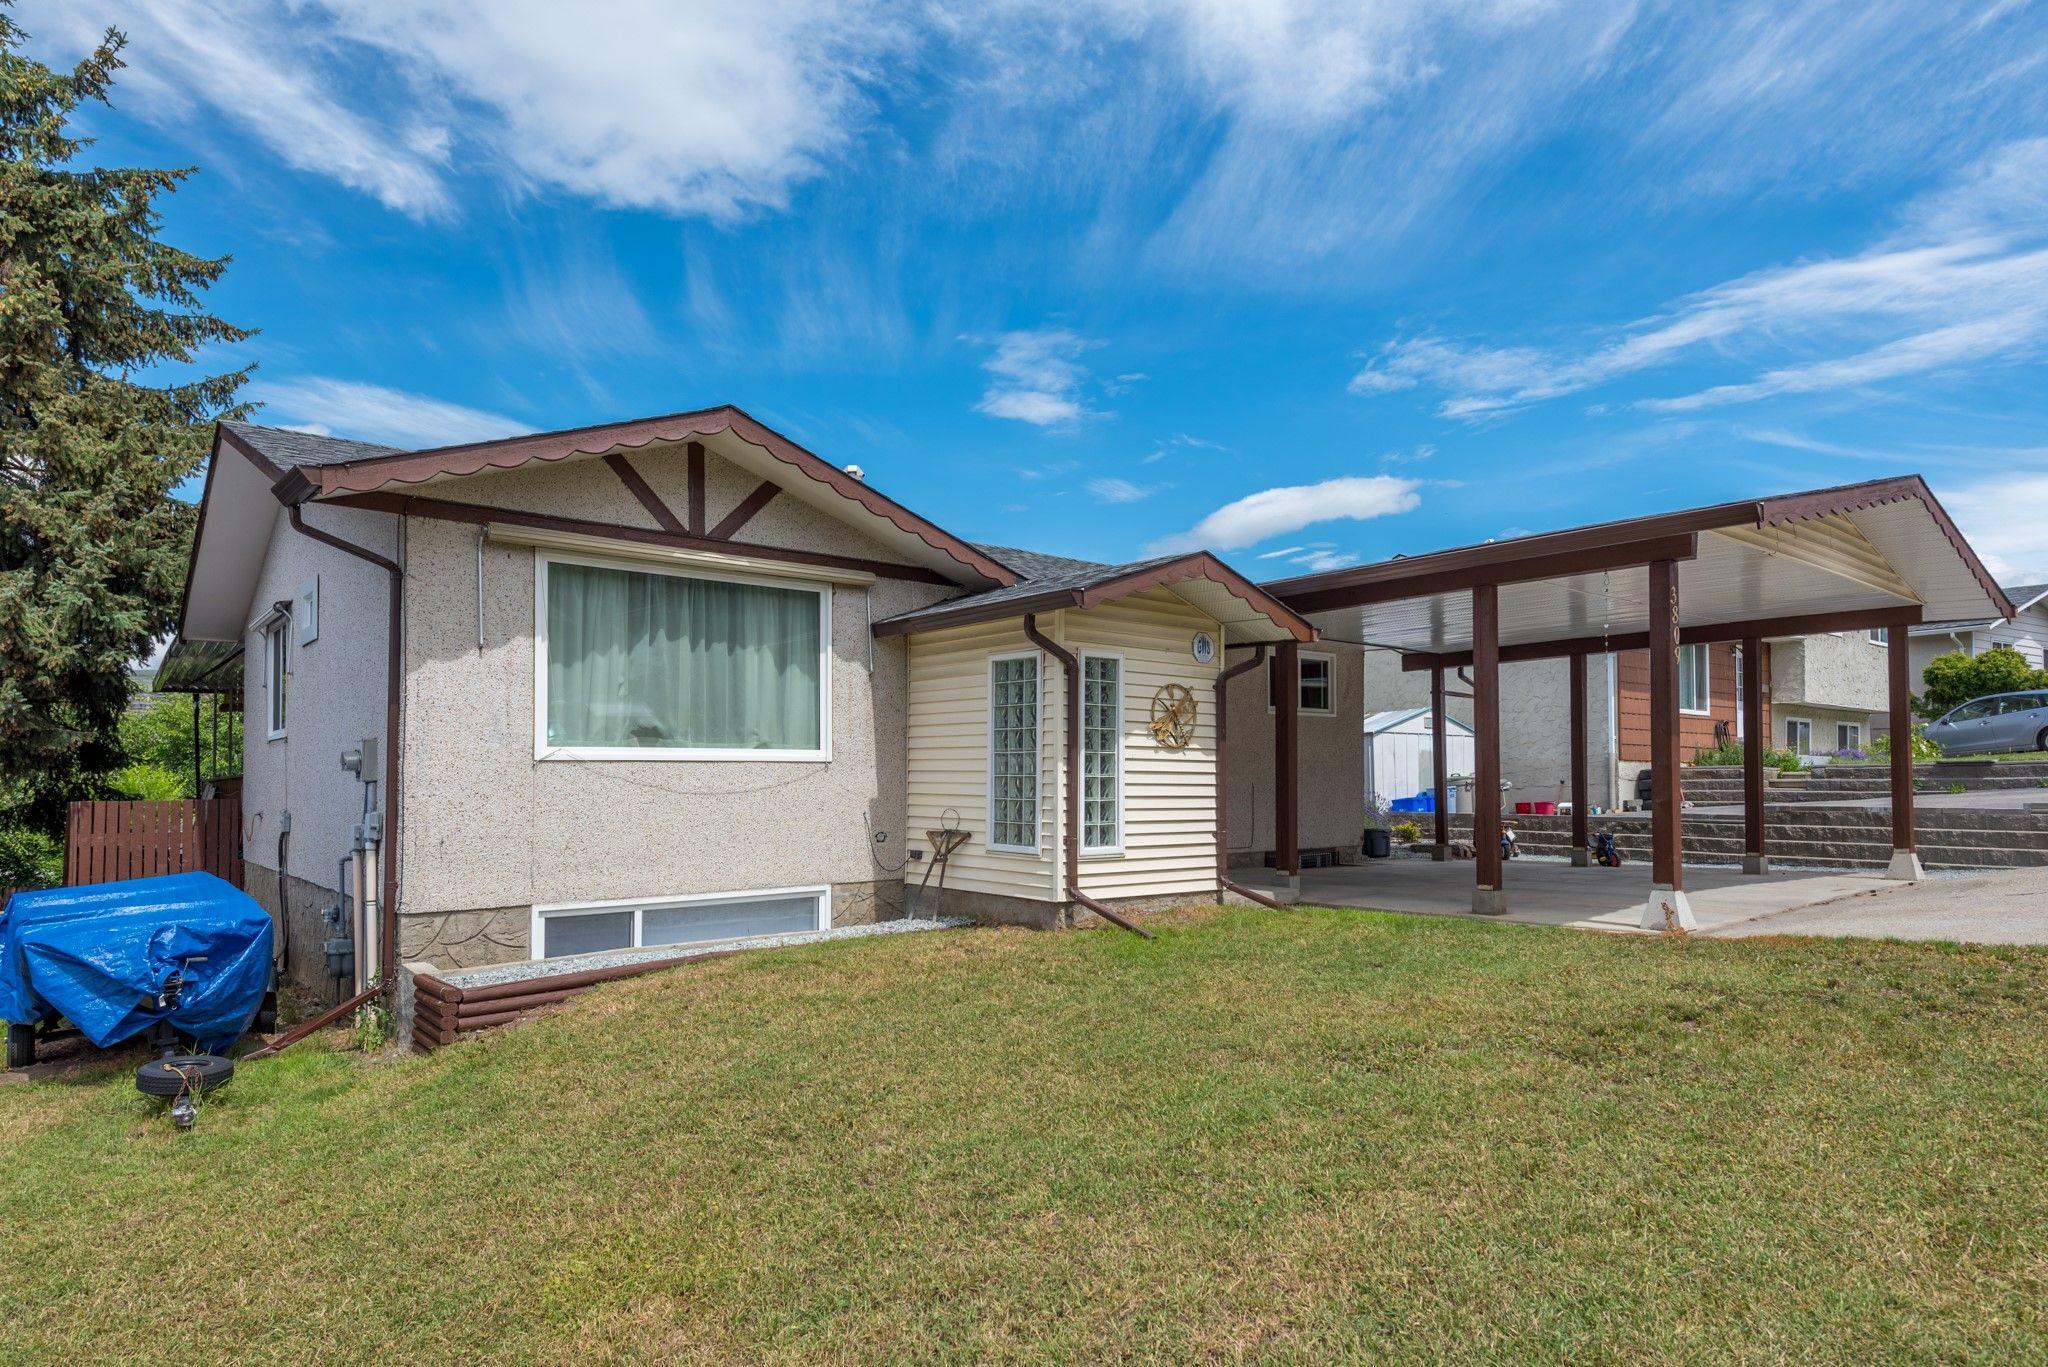 Main Photo: 3809 21 Avenue in Vernon: Mission Hill House for sale (North Okanagan)  : MLS®# 10163250